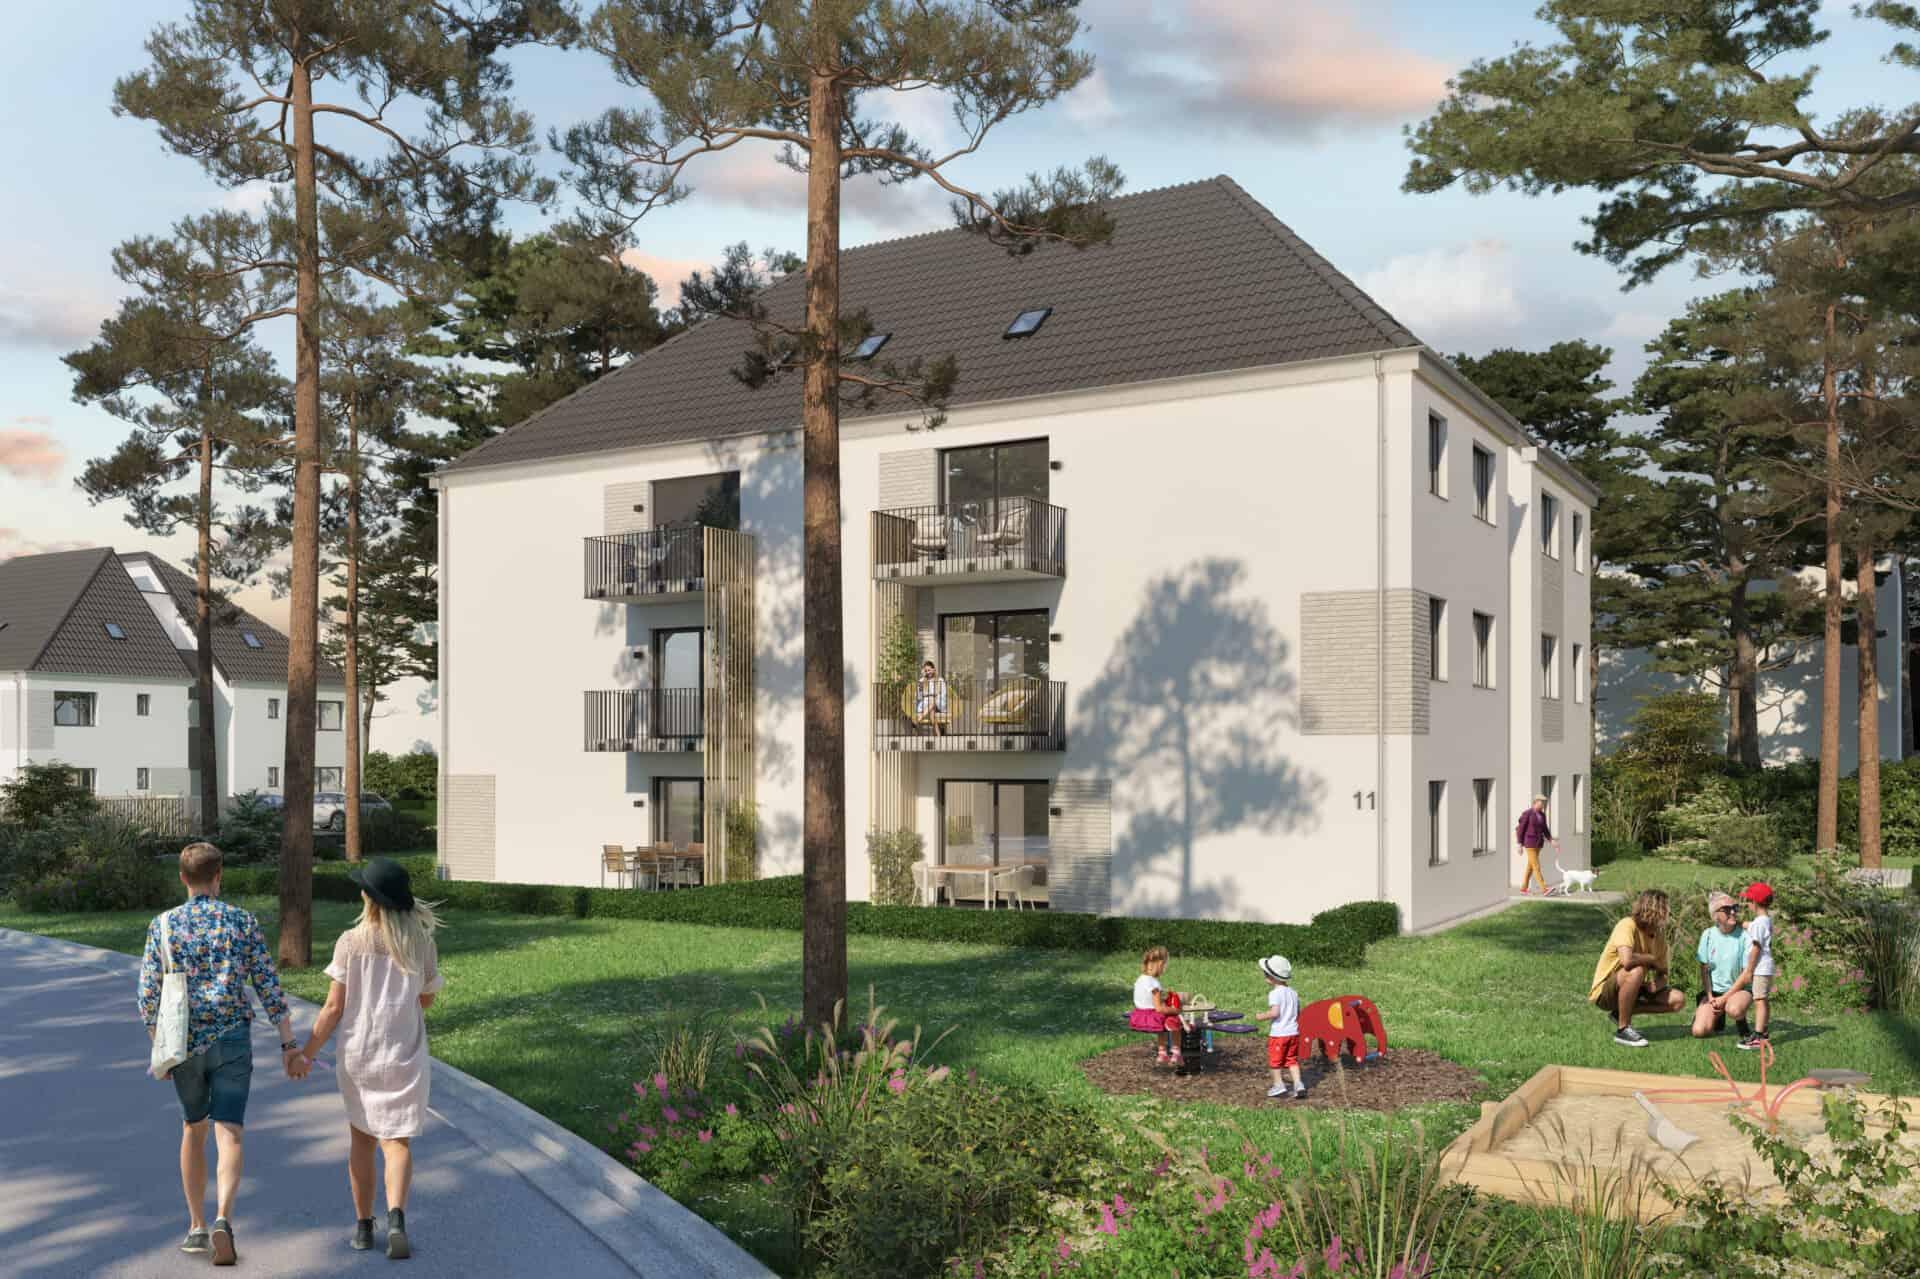 Wohnprojekt 4 Trees Wustermark im Berliner Speckgürtel - C&P Immobilien AG